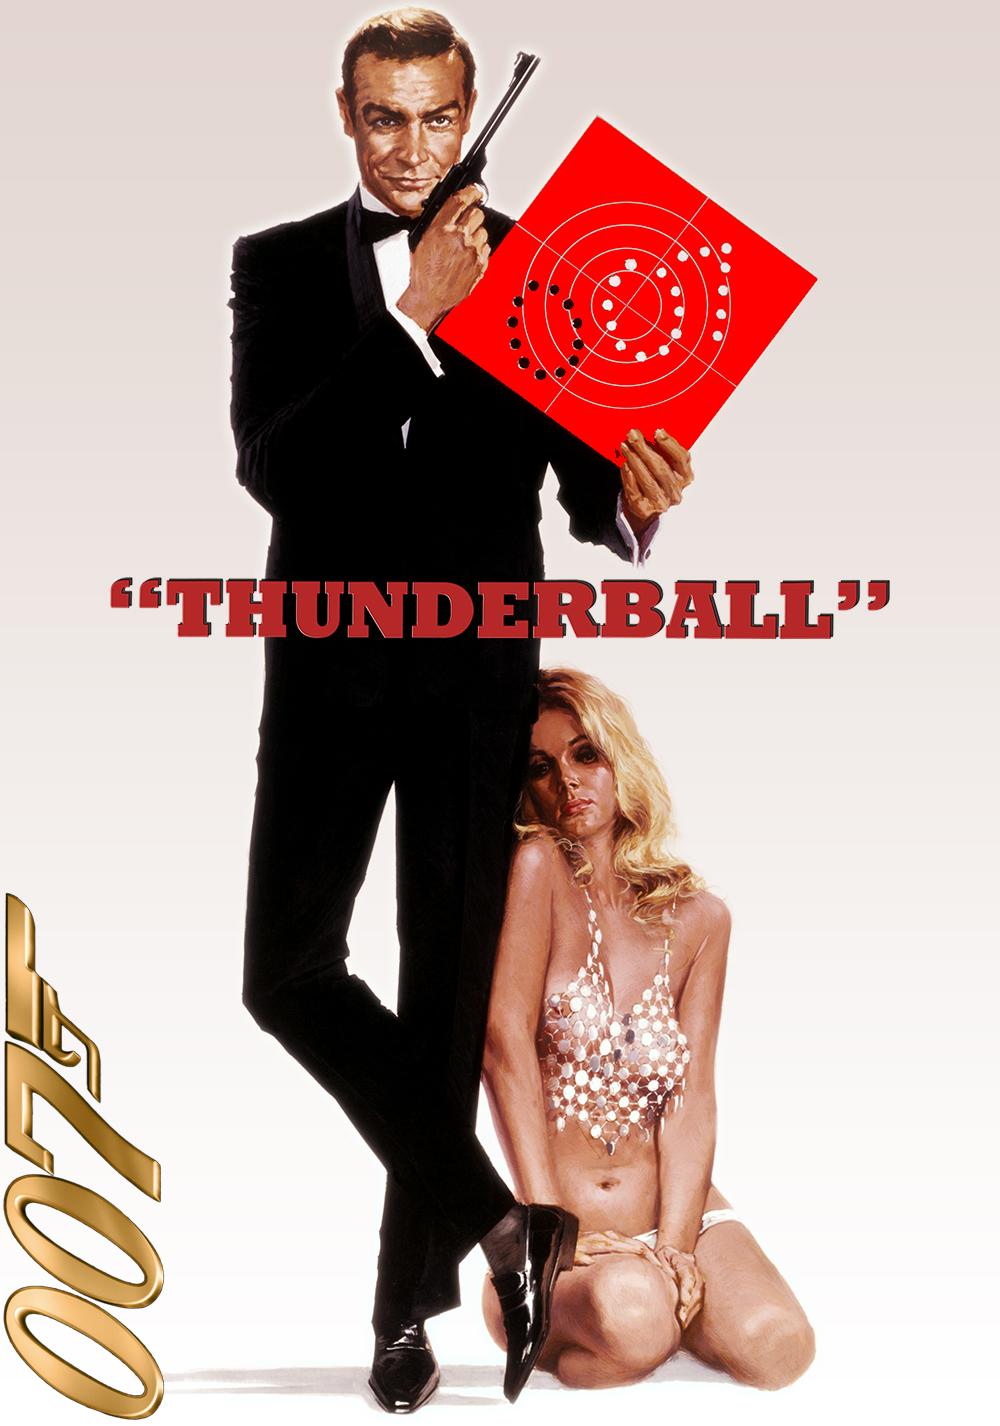 Thunderball : Movie fanart : fanart.tv